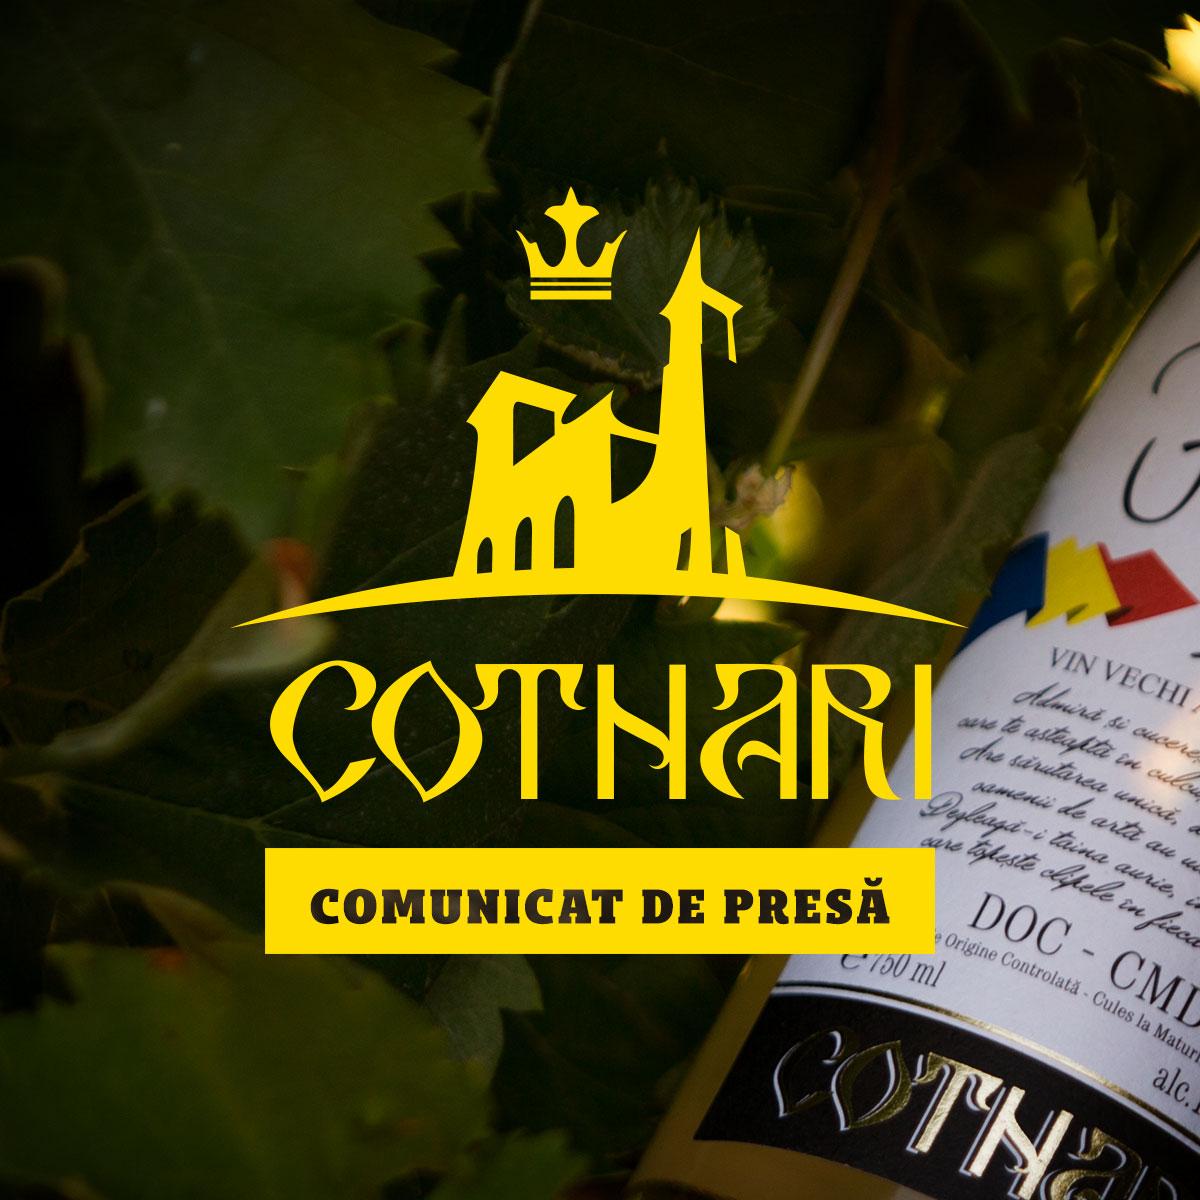 https://www.cotnari.ro/continut/uploads/2017/08/comunicat8.jpg